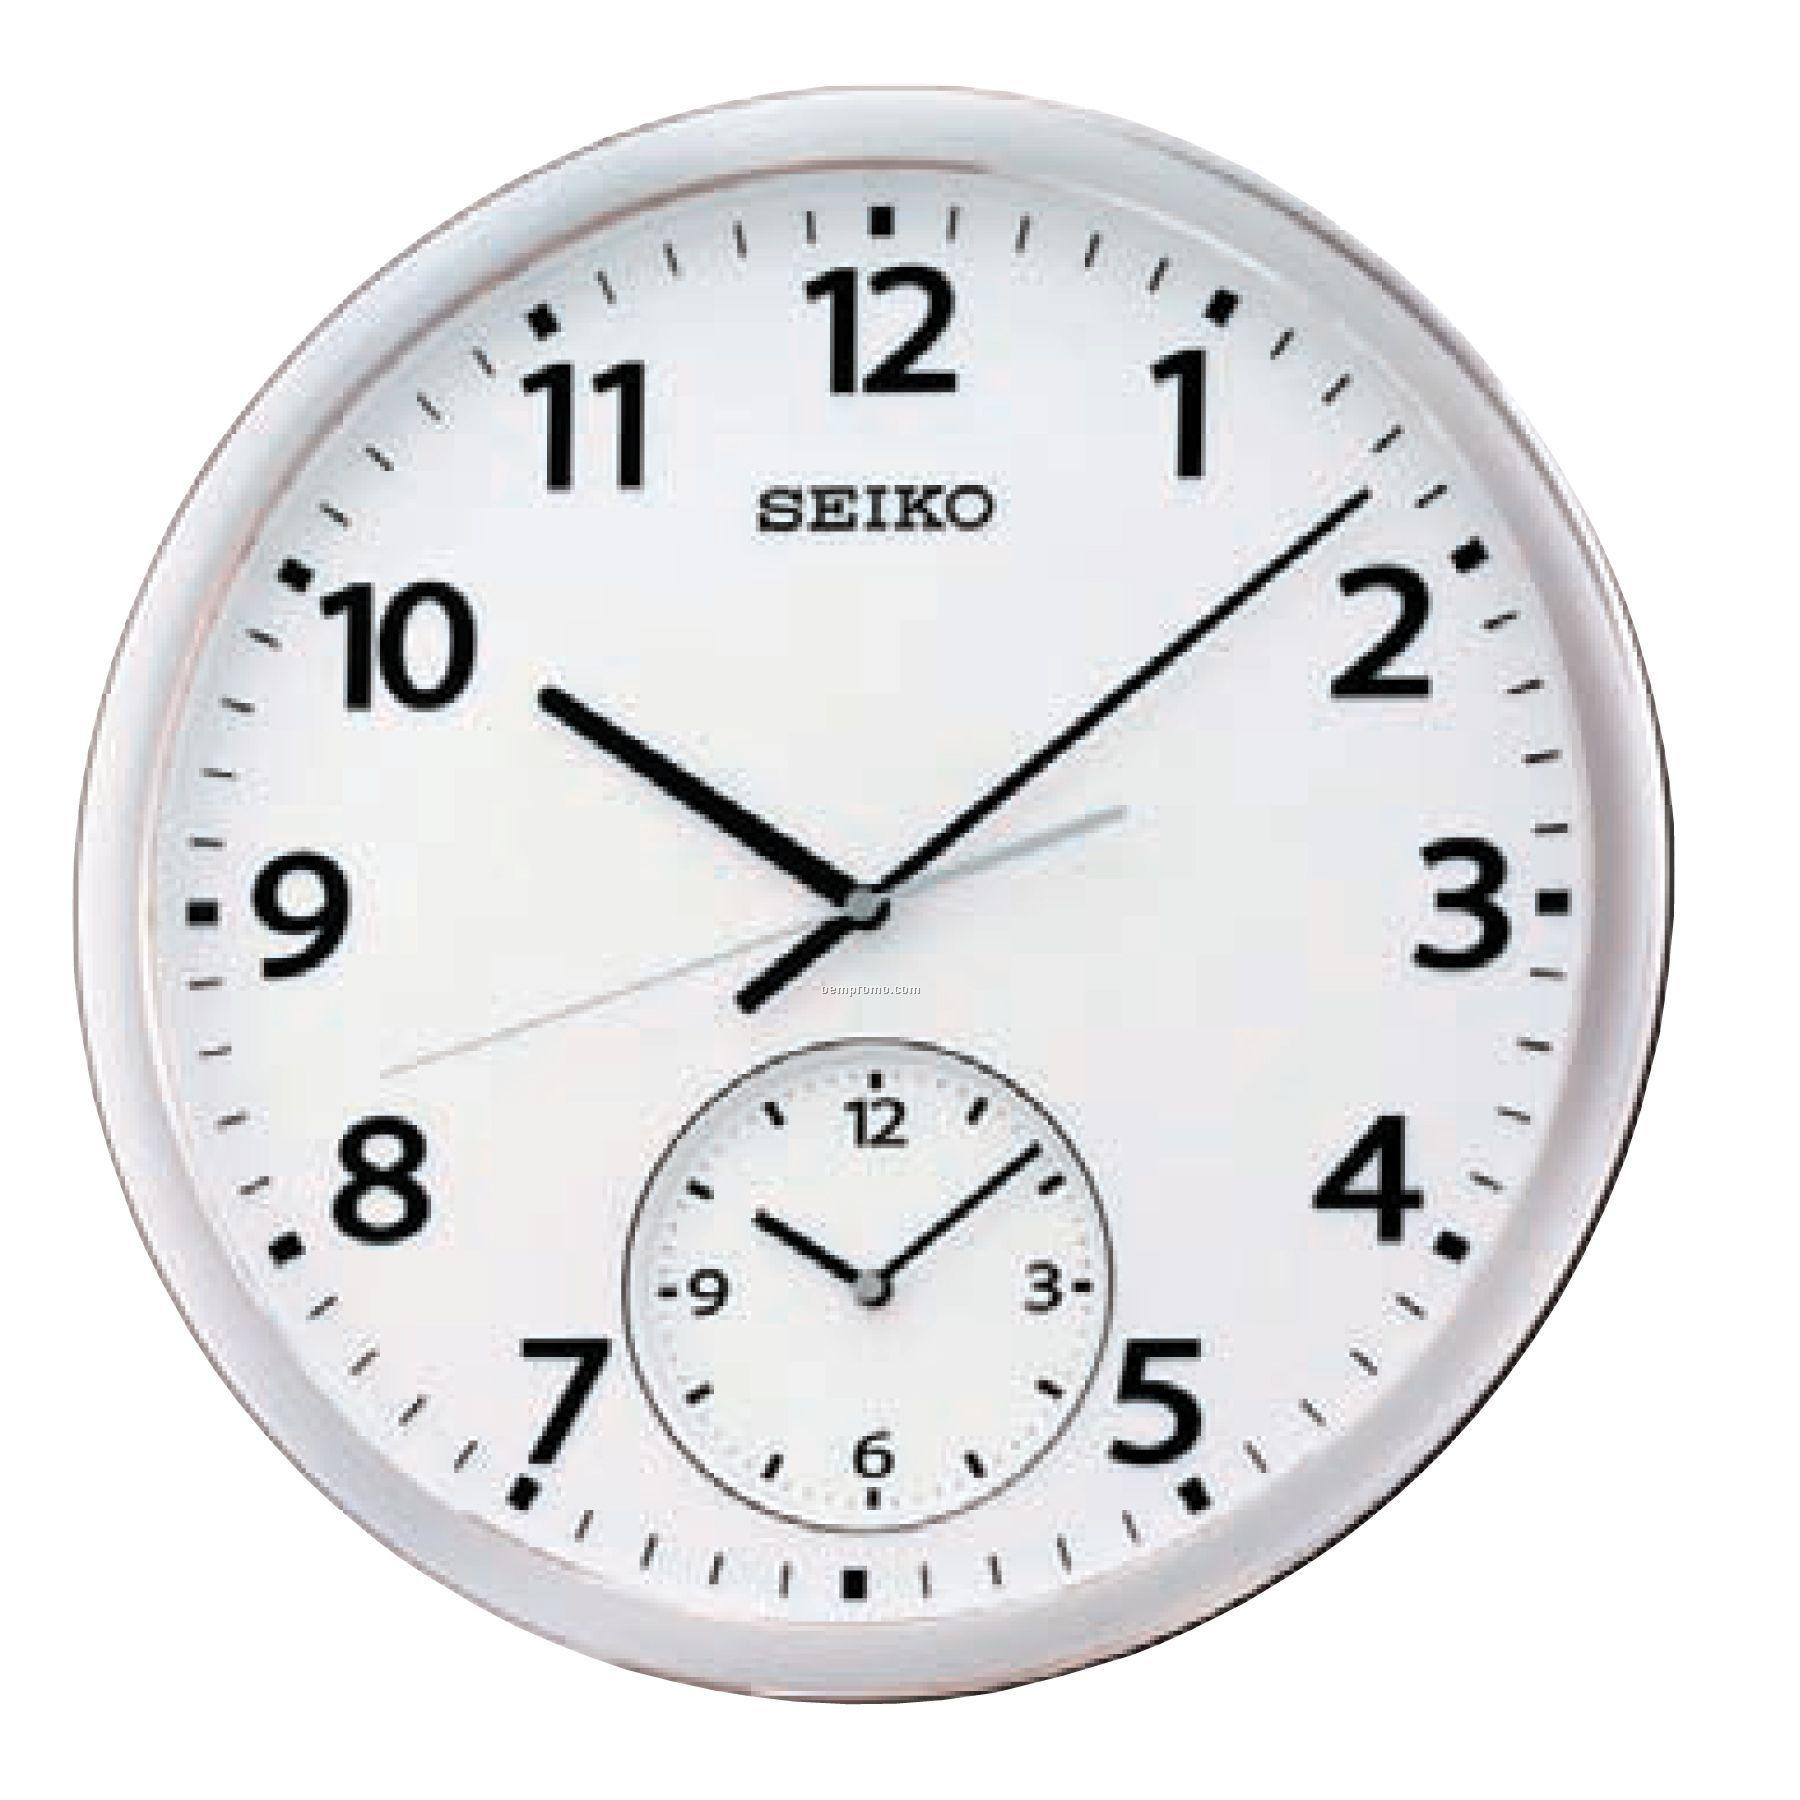 Seiko Wall Clock China Wholesale Seiko Wall Clock